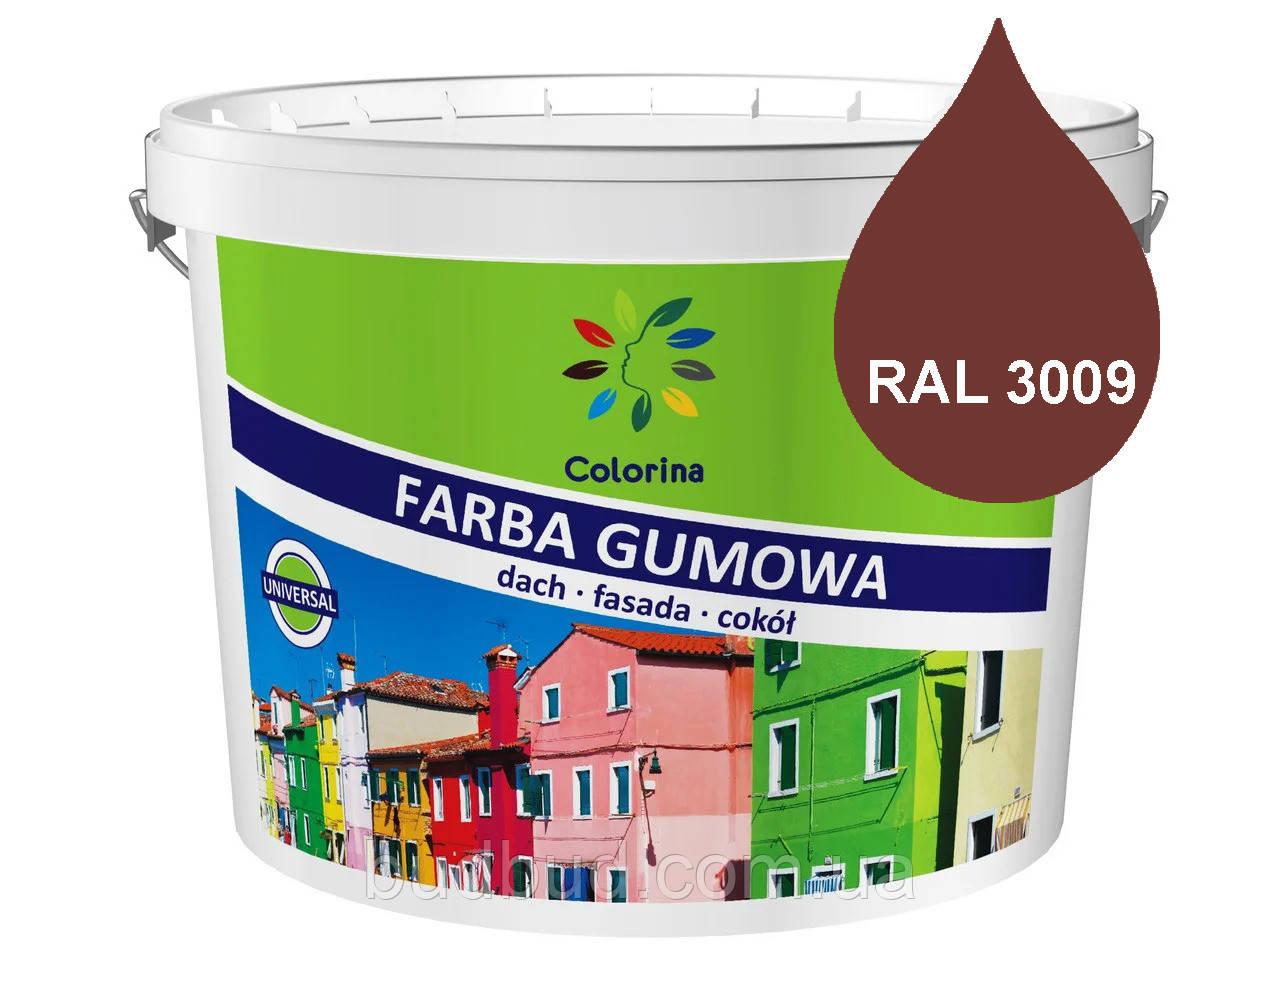 Фарба гумова червоно-коричнева RAL 3009 COLORINA  6 кг